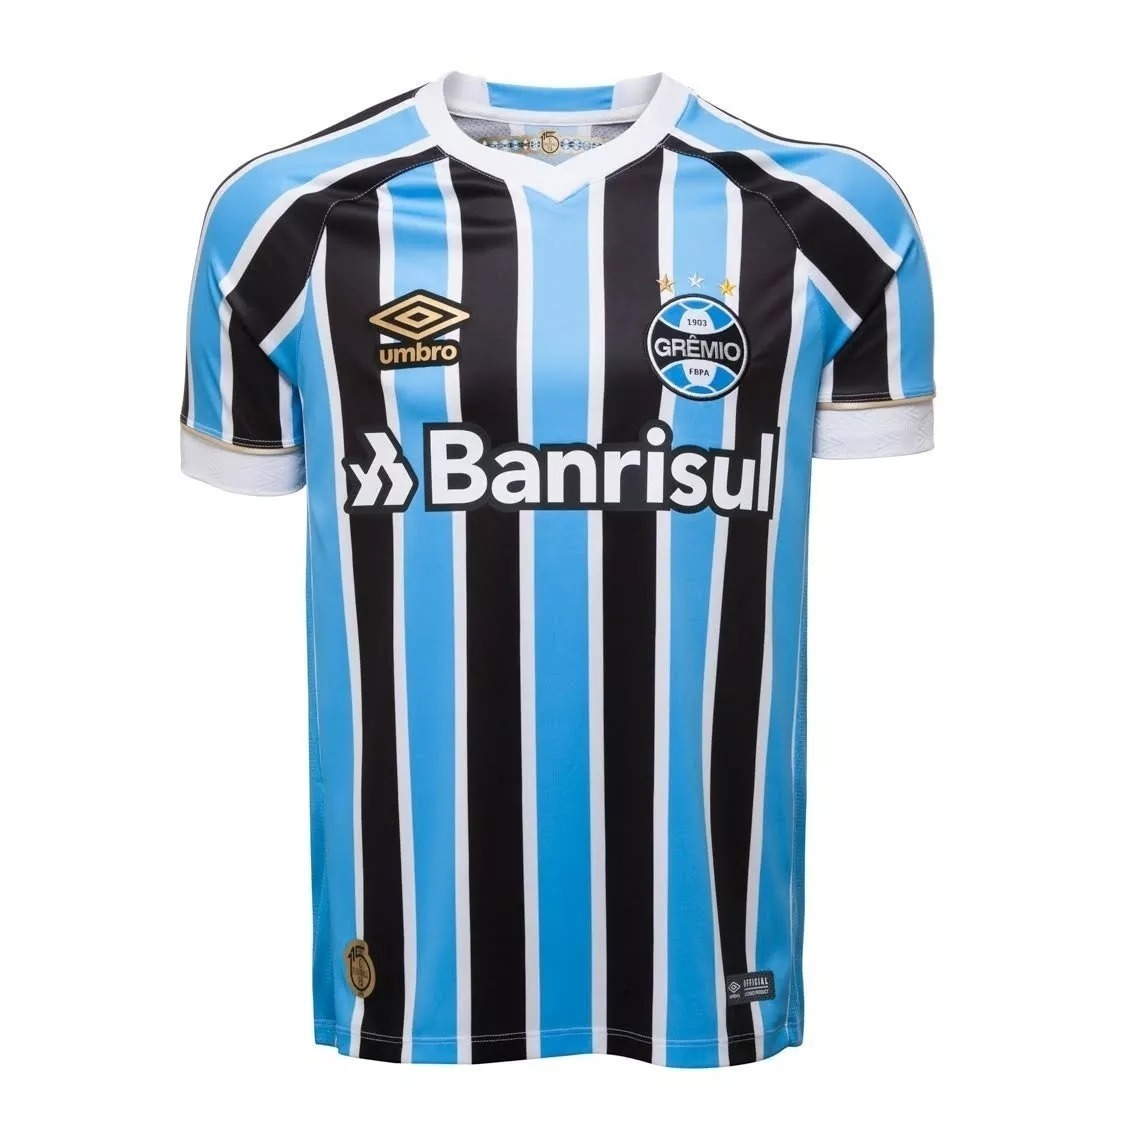 ddb4ca1ad Camiseta Grêmio S n° Nova 2018 2019 Original Masculina Game - R  170 ...